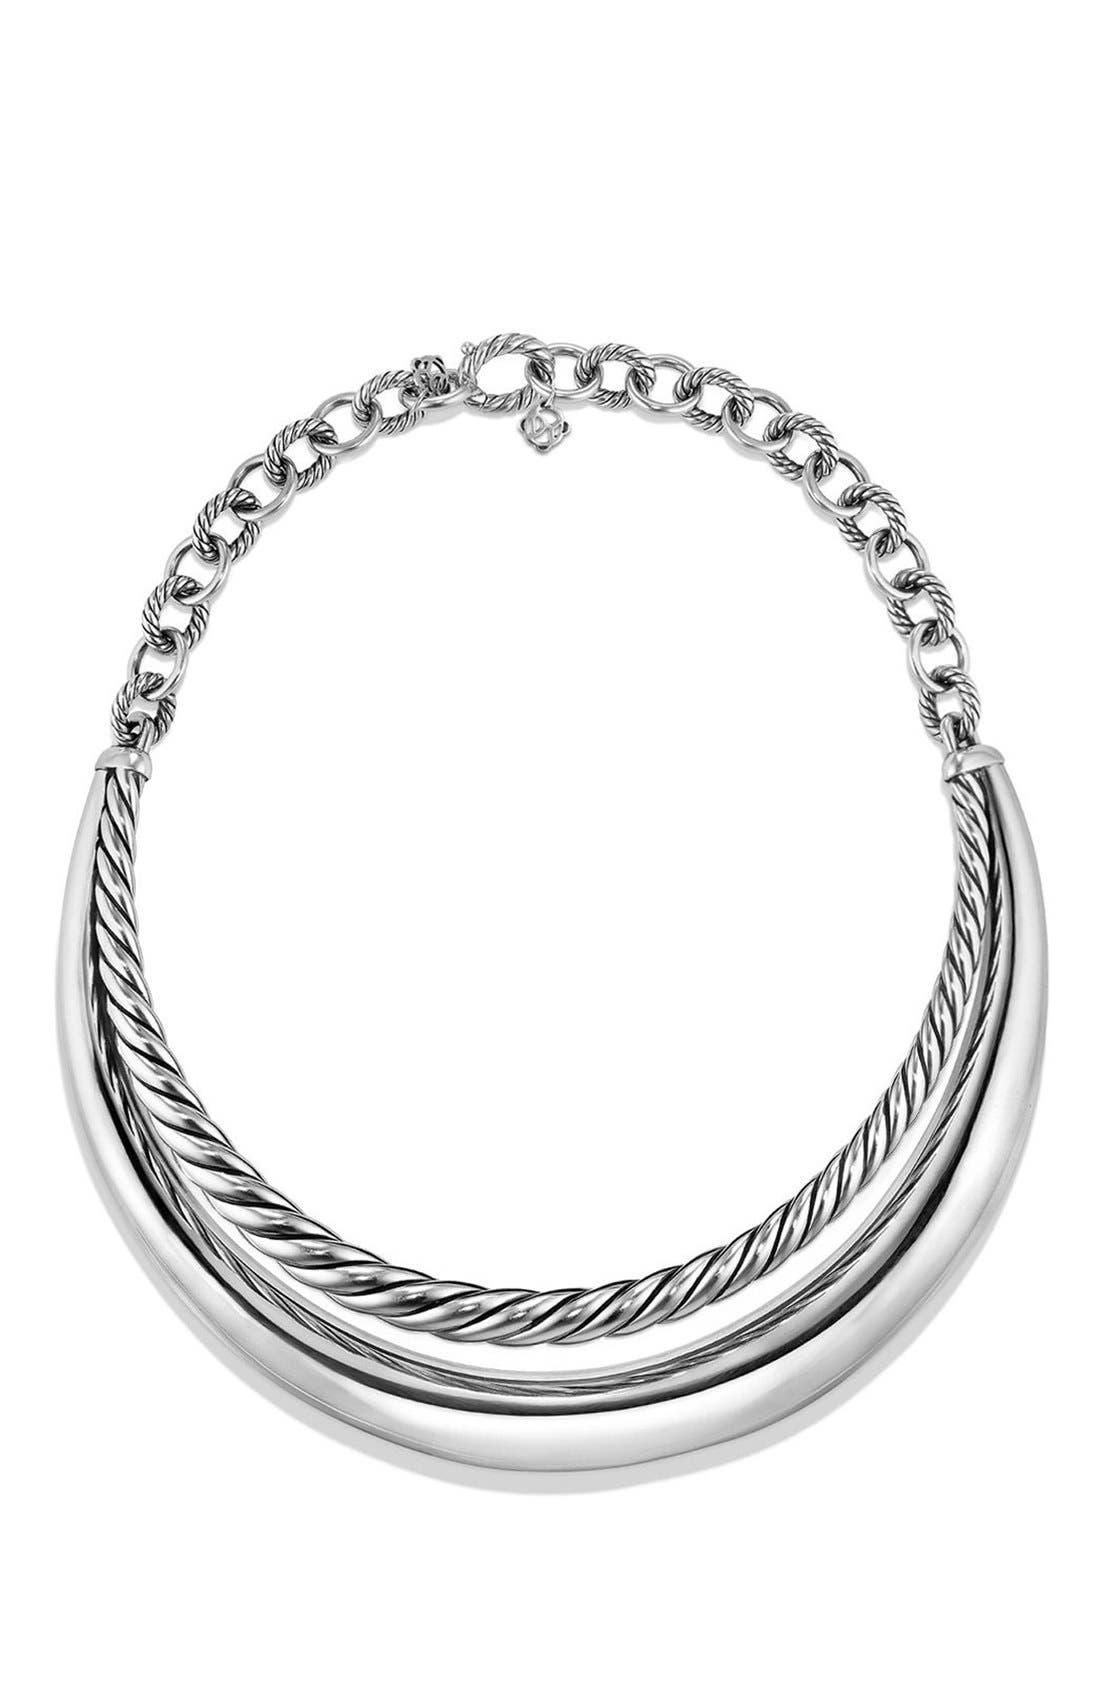 Pure Form Collar Necklace,                         Main,                         color, Silver